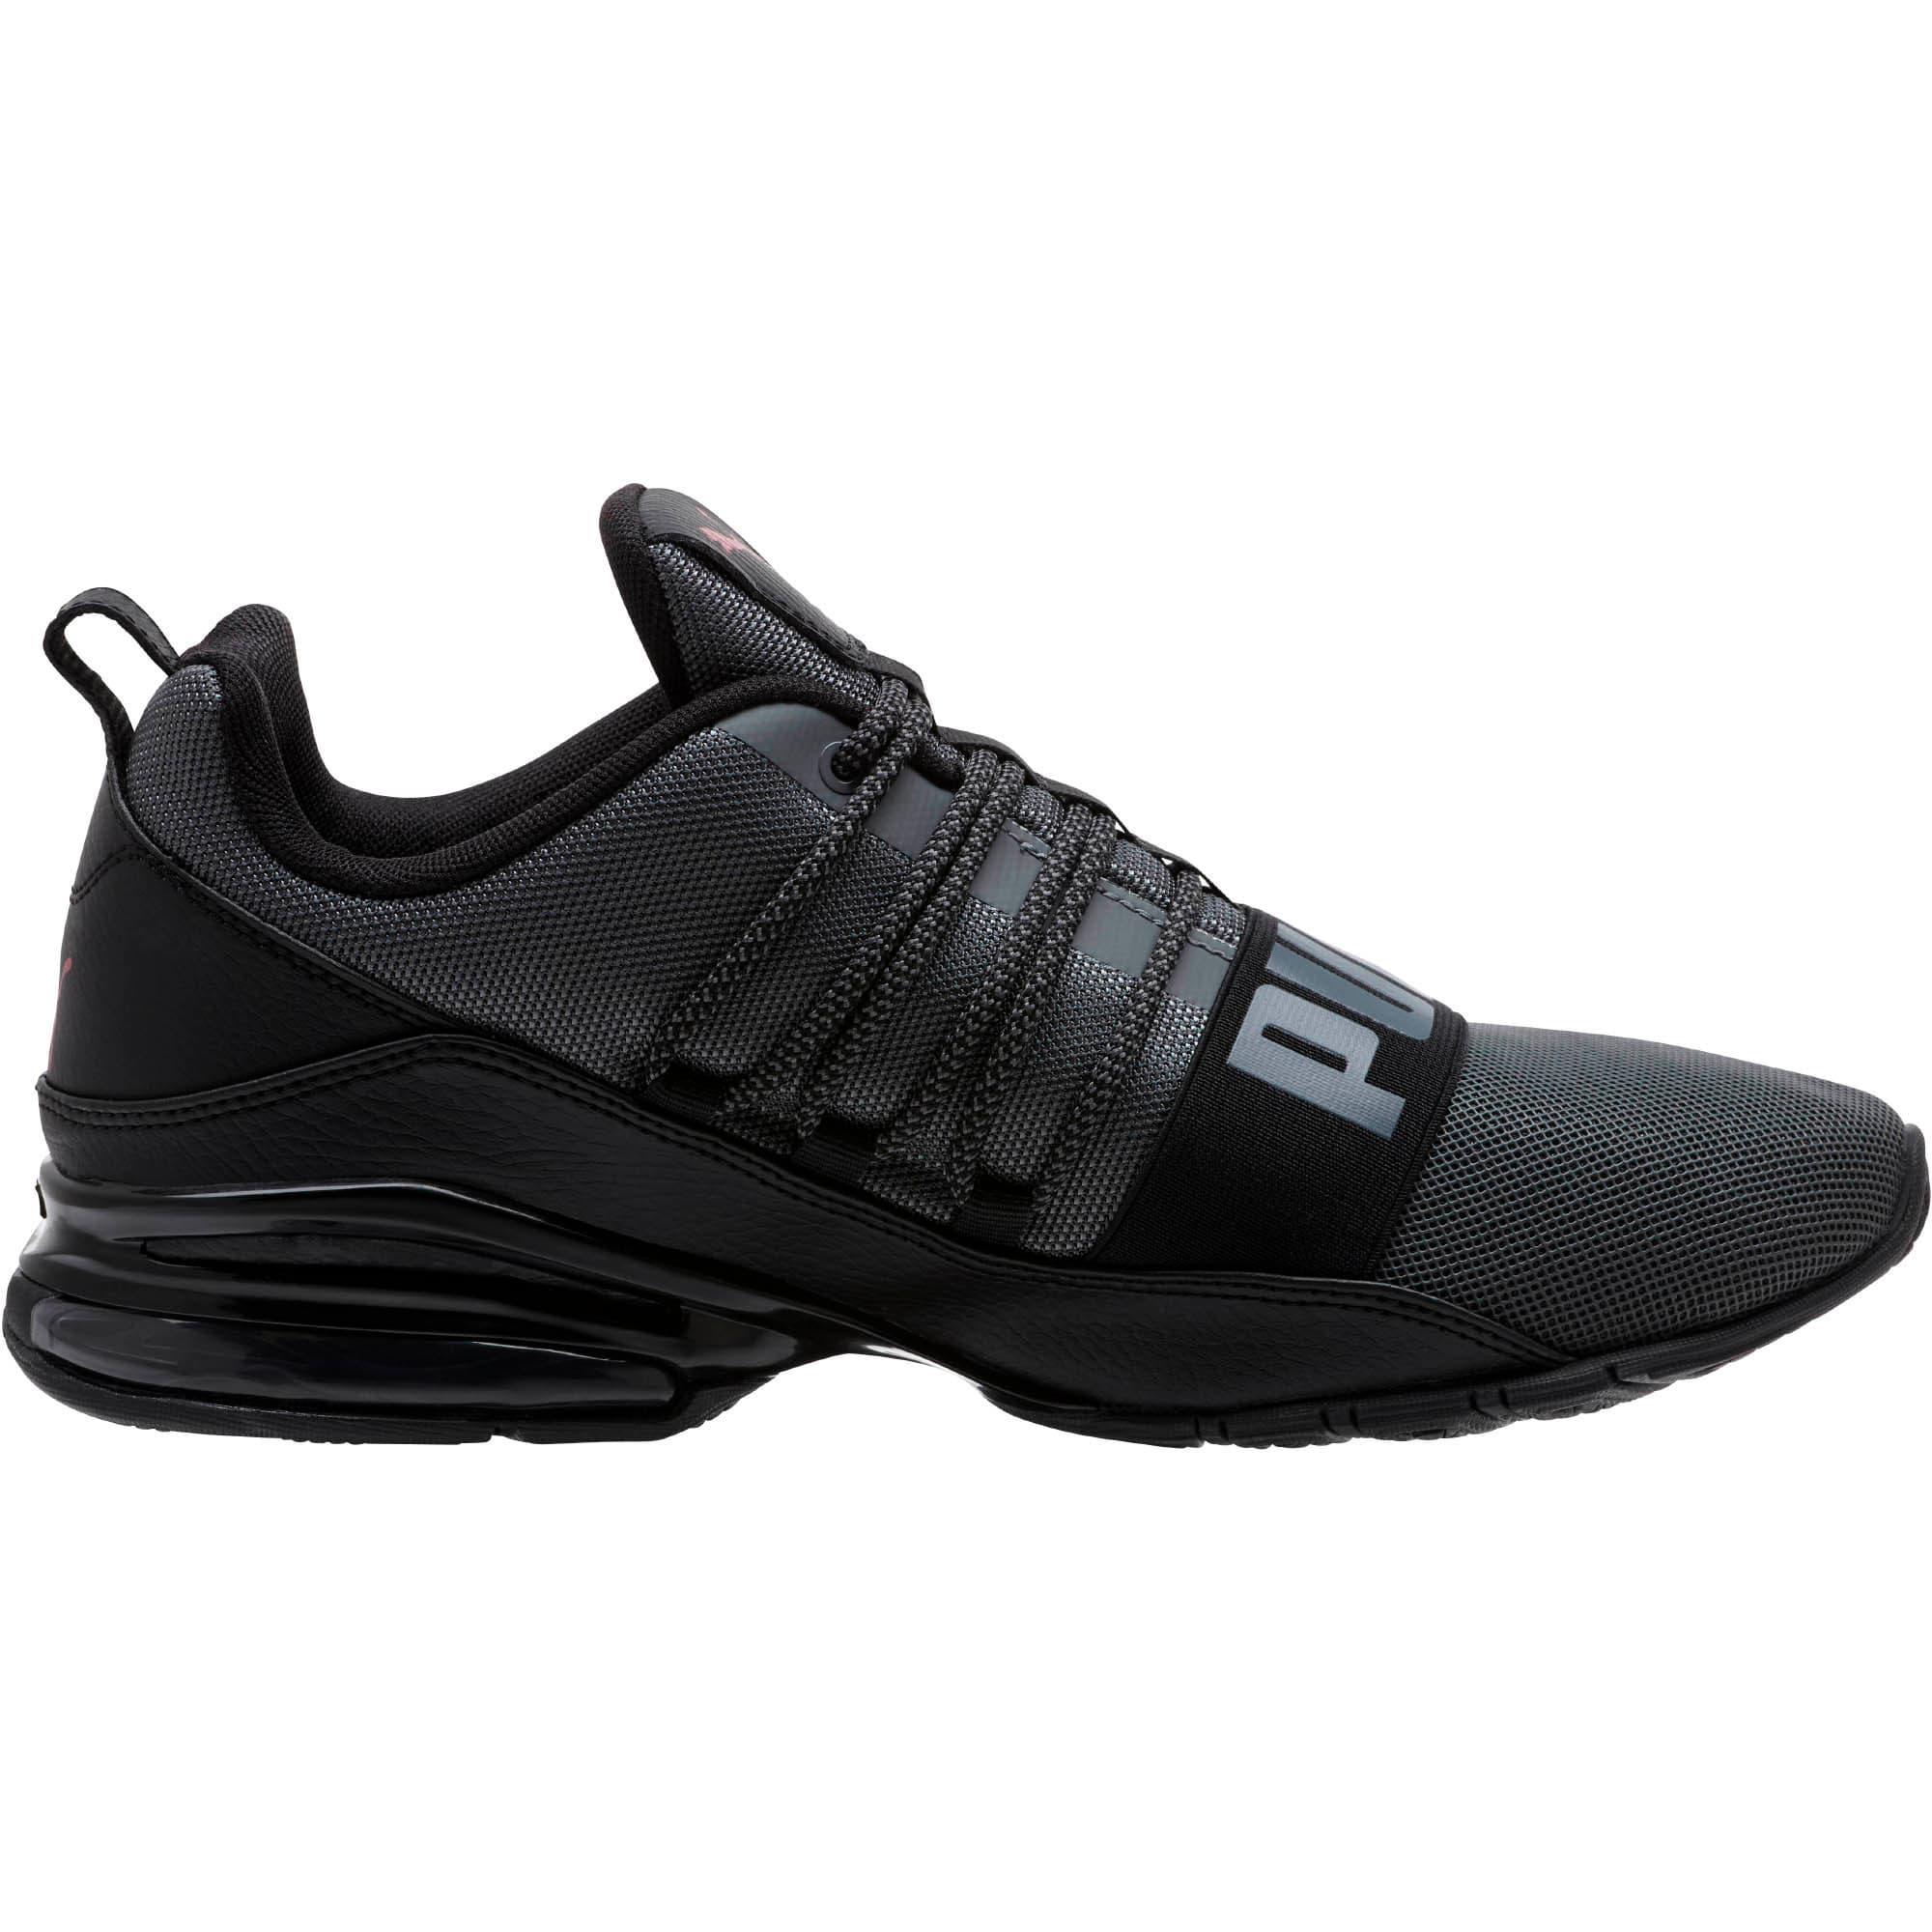 Thumbnail 3 of Cell Regulate KRM Men's Running Shoes, IronGate-PumaBlack-Pomegrnt, medium